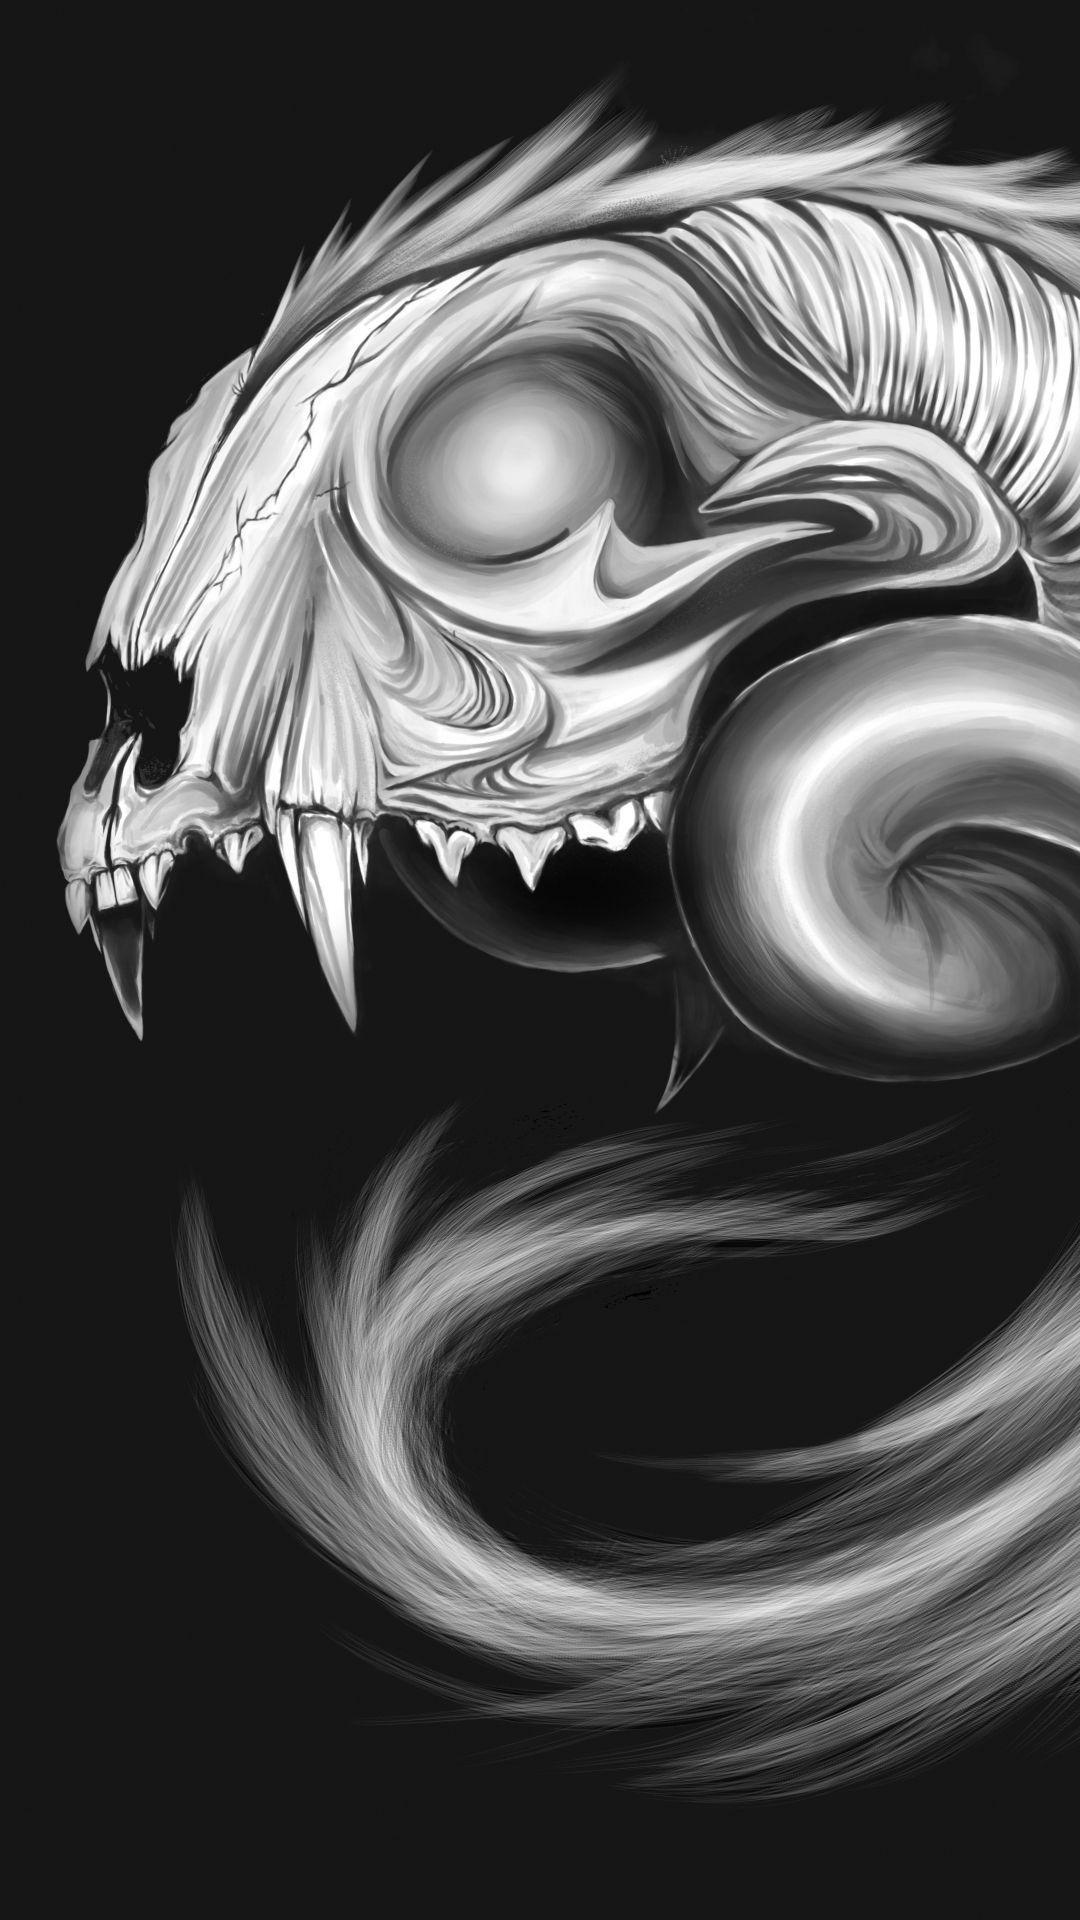 Skulls and Dragons Wallpapers - Top Free Skulls and Dragons